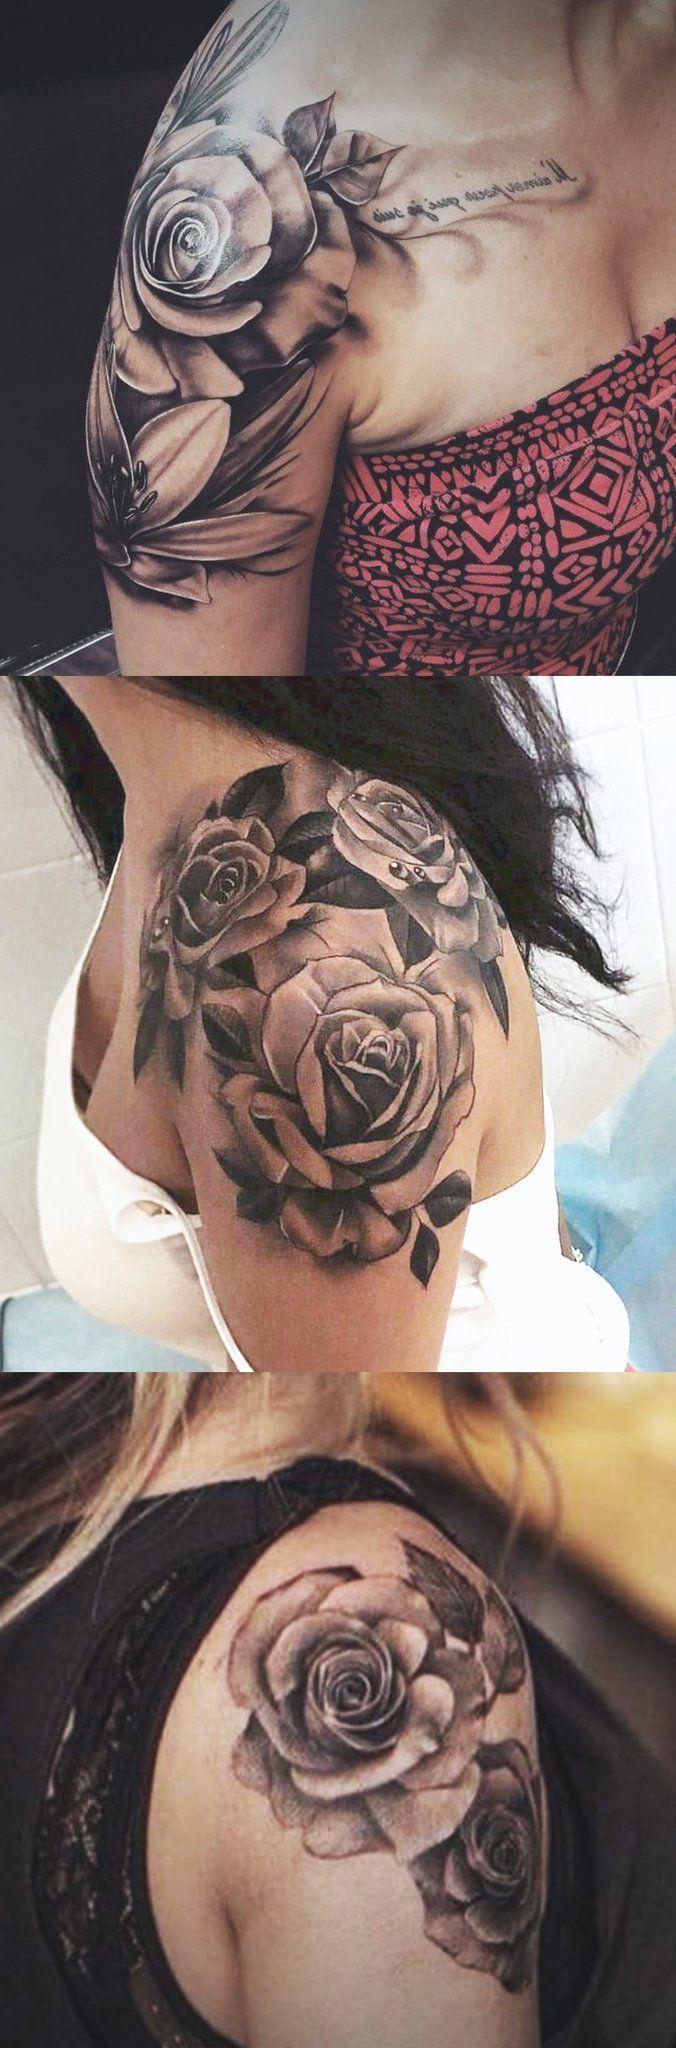 Women's Rose Shoulder Tattoo Ideas in Black and White Realistic Left Floral Arm Sleeve Tatouage Ideas Del Tatuaje - www.MyBodiArt.com #tattooremovalnatural